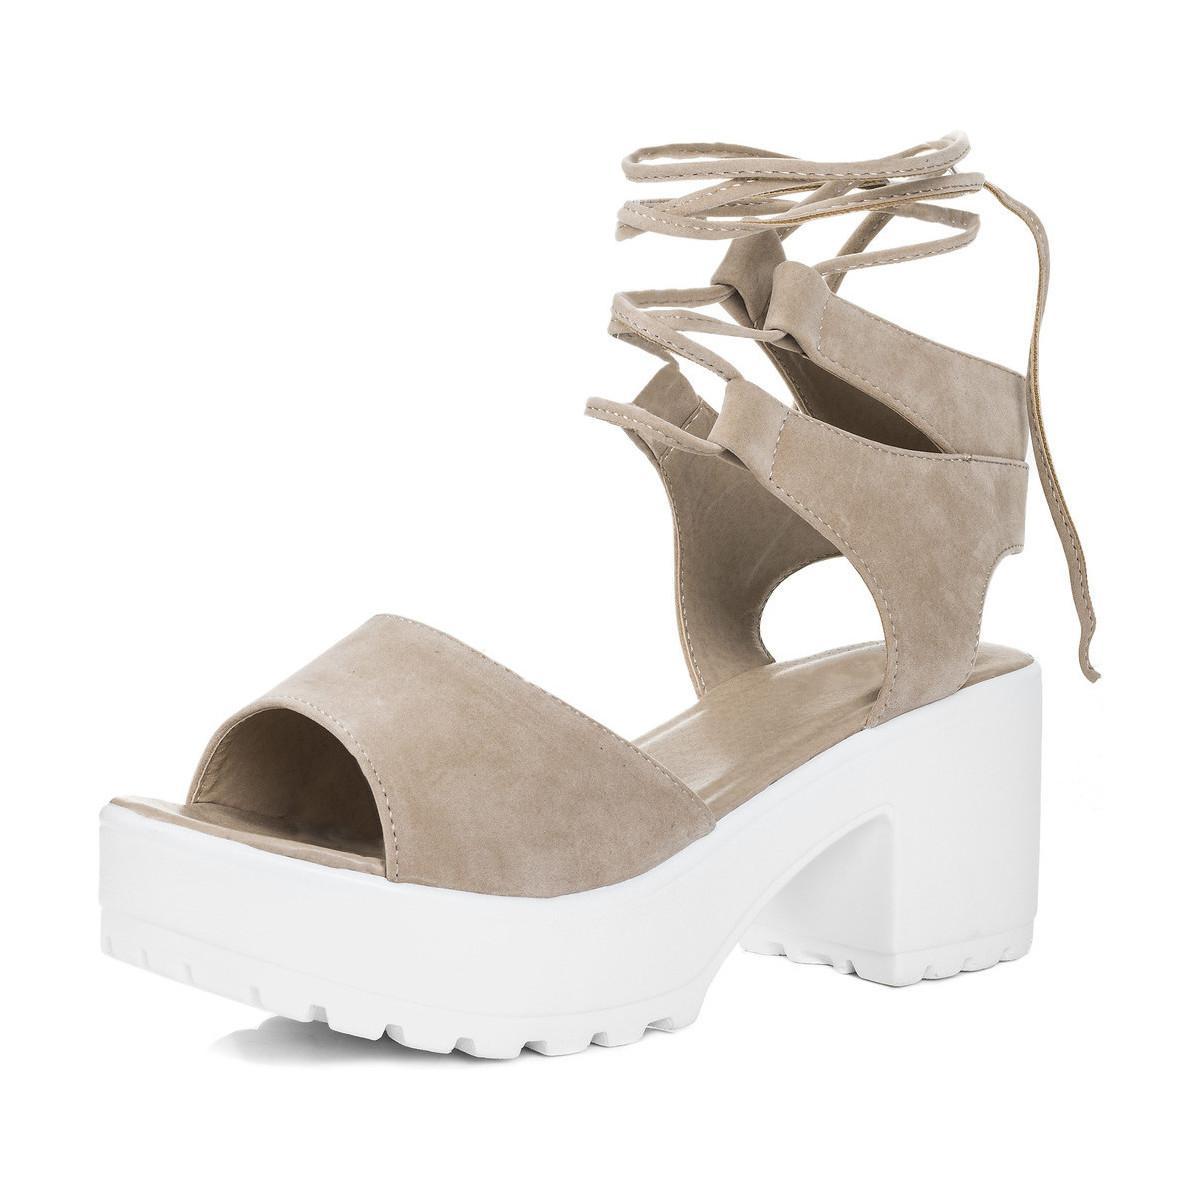 16781d8200f Spylovebuy Molly Open Peep Toe Mid Heel Sandals Shoes - Nude Suede ...